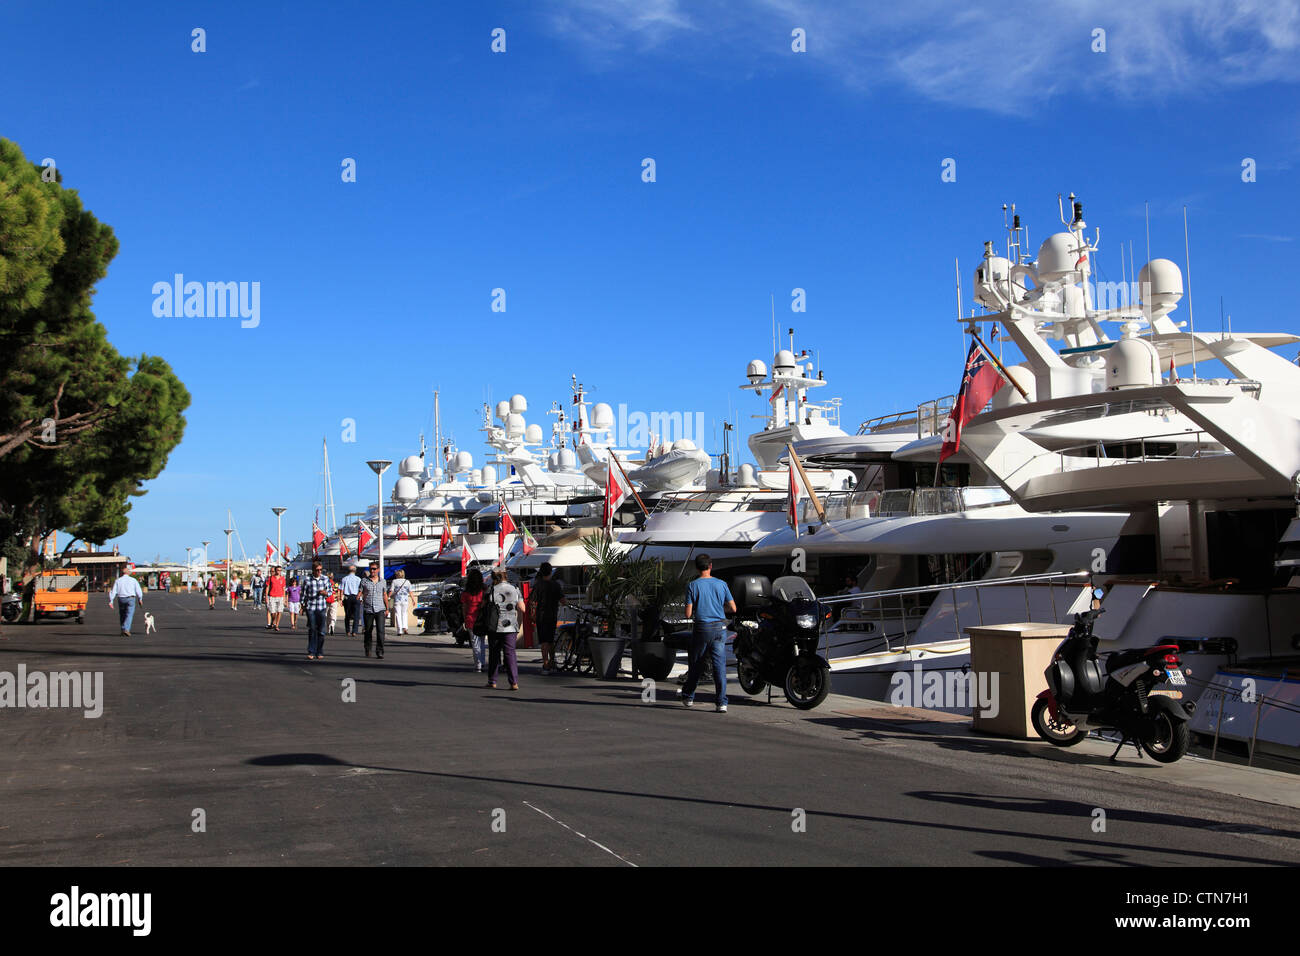 Yachts, Port Hercule, Harbor, Monte Carlo, Monaco, Cote d Azur, Mediterranean, Europe - Stock Image